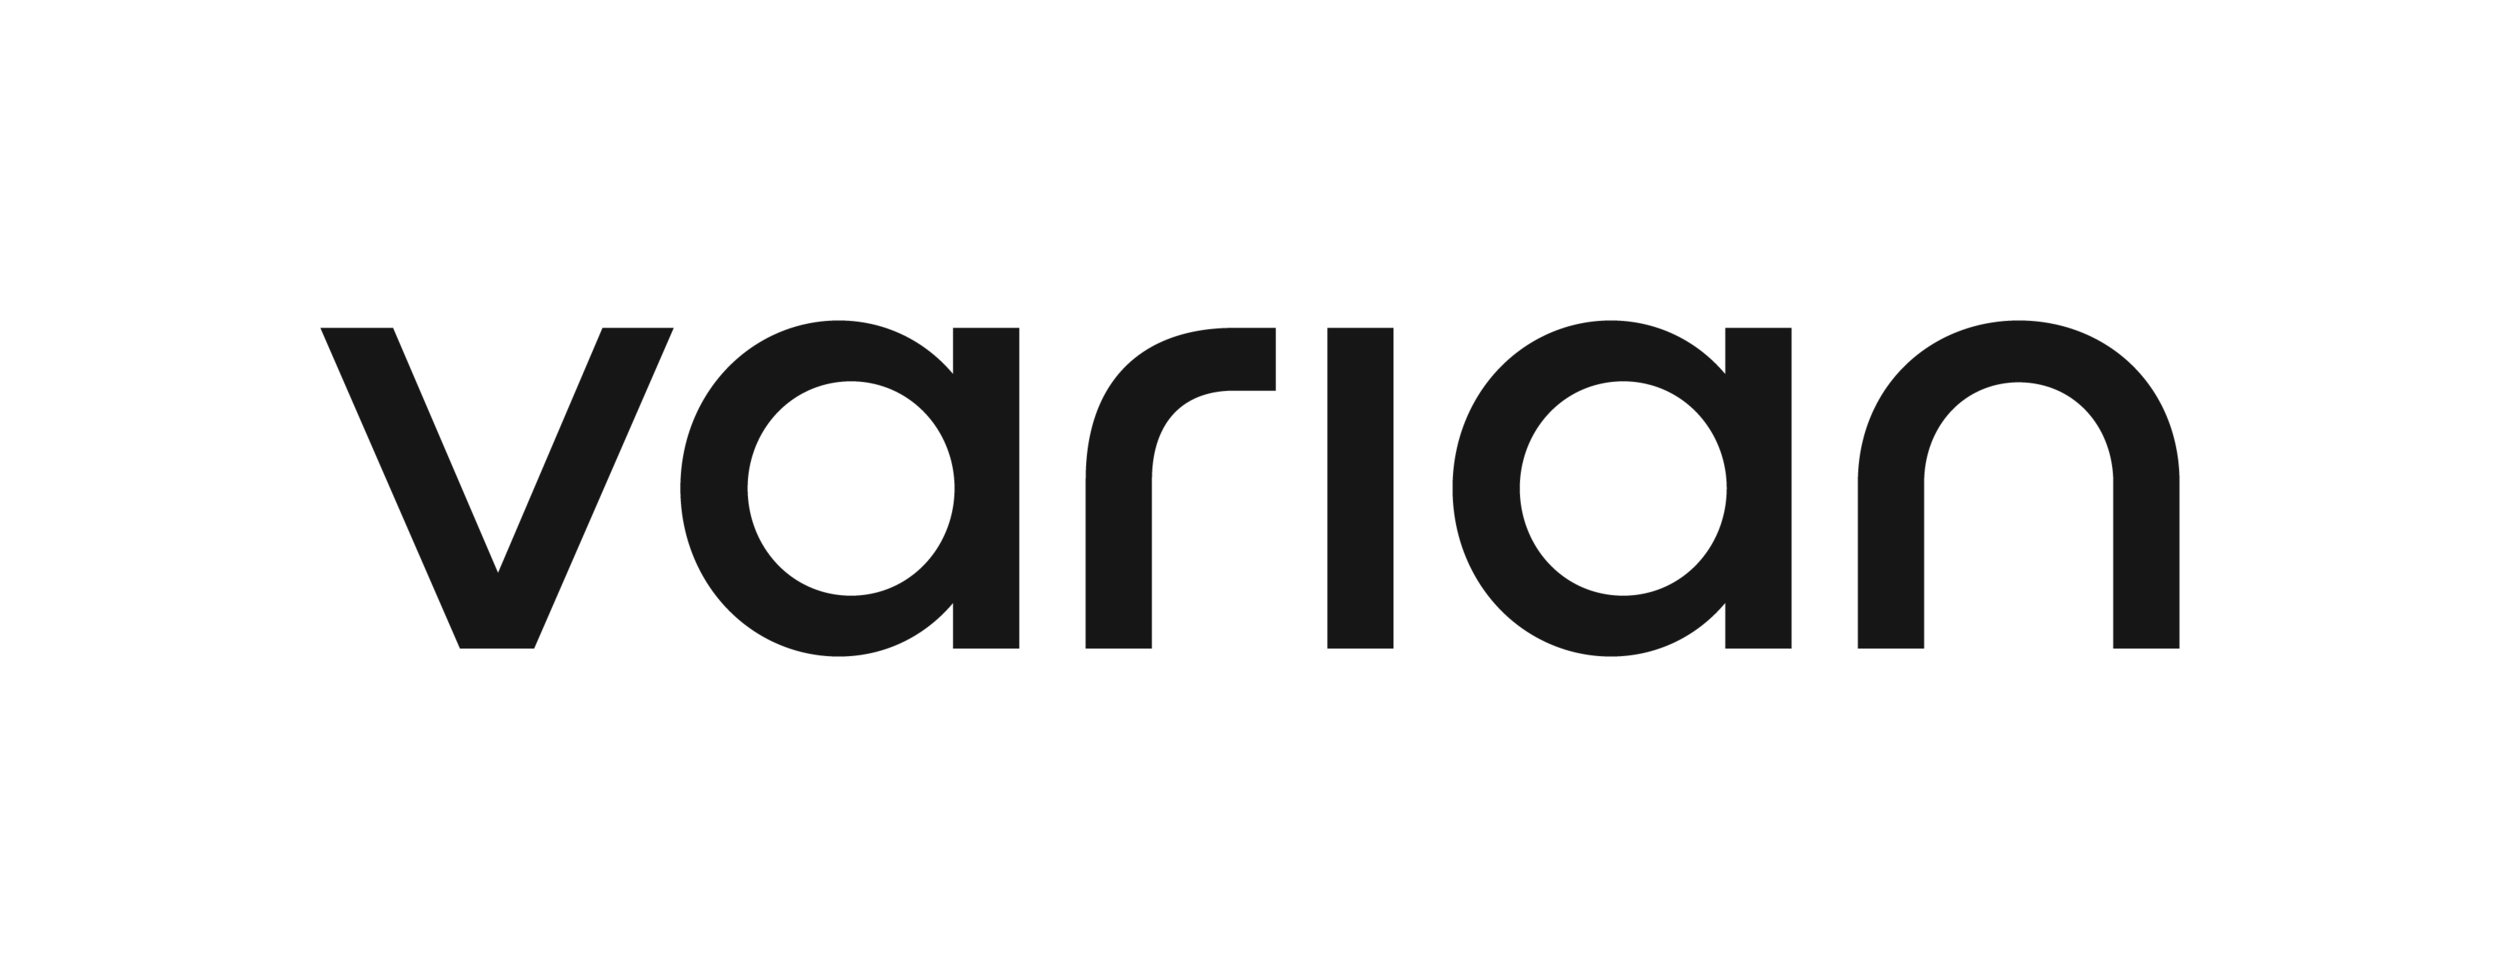 Varian Final logo